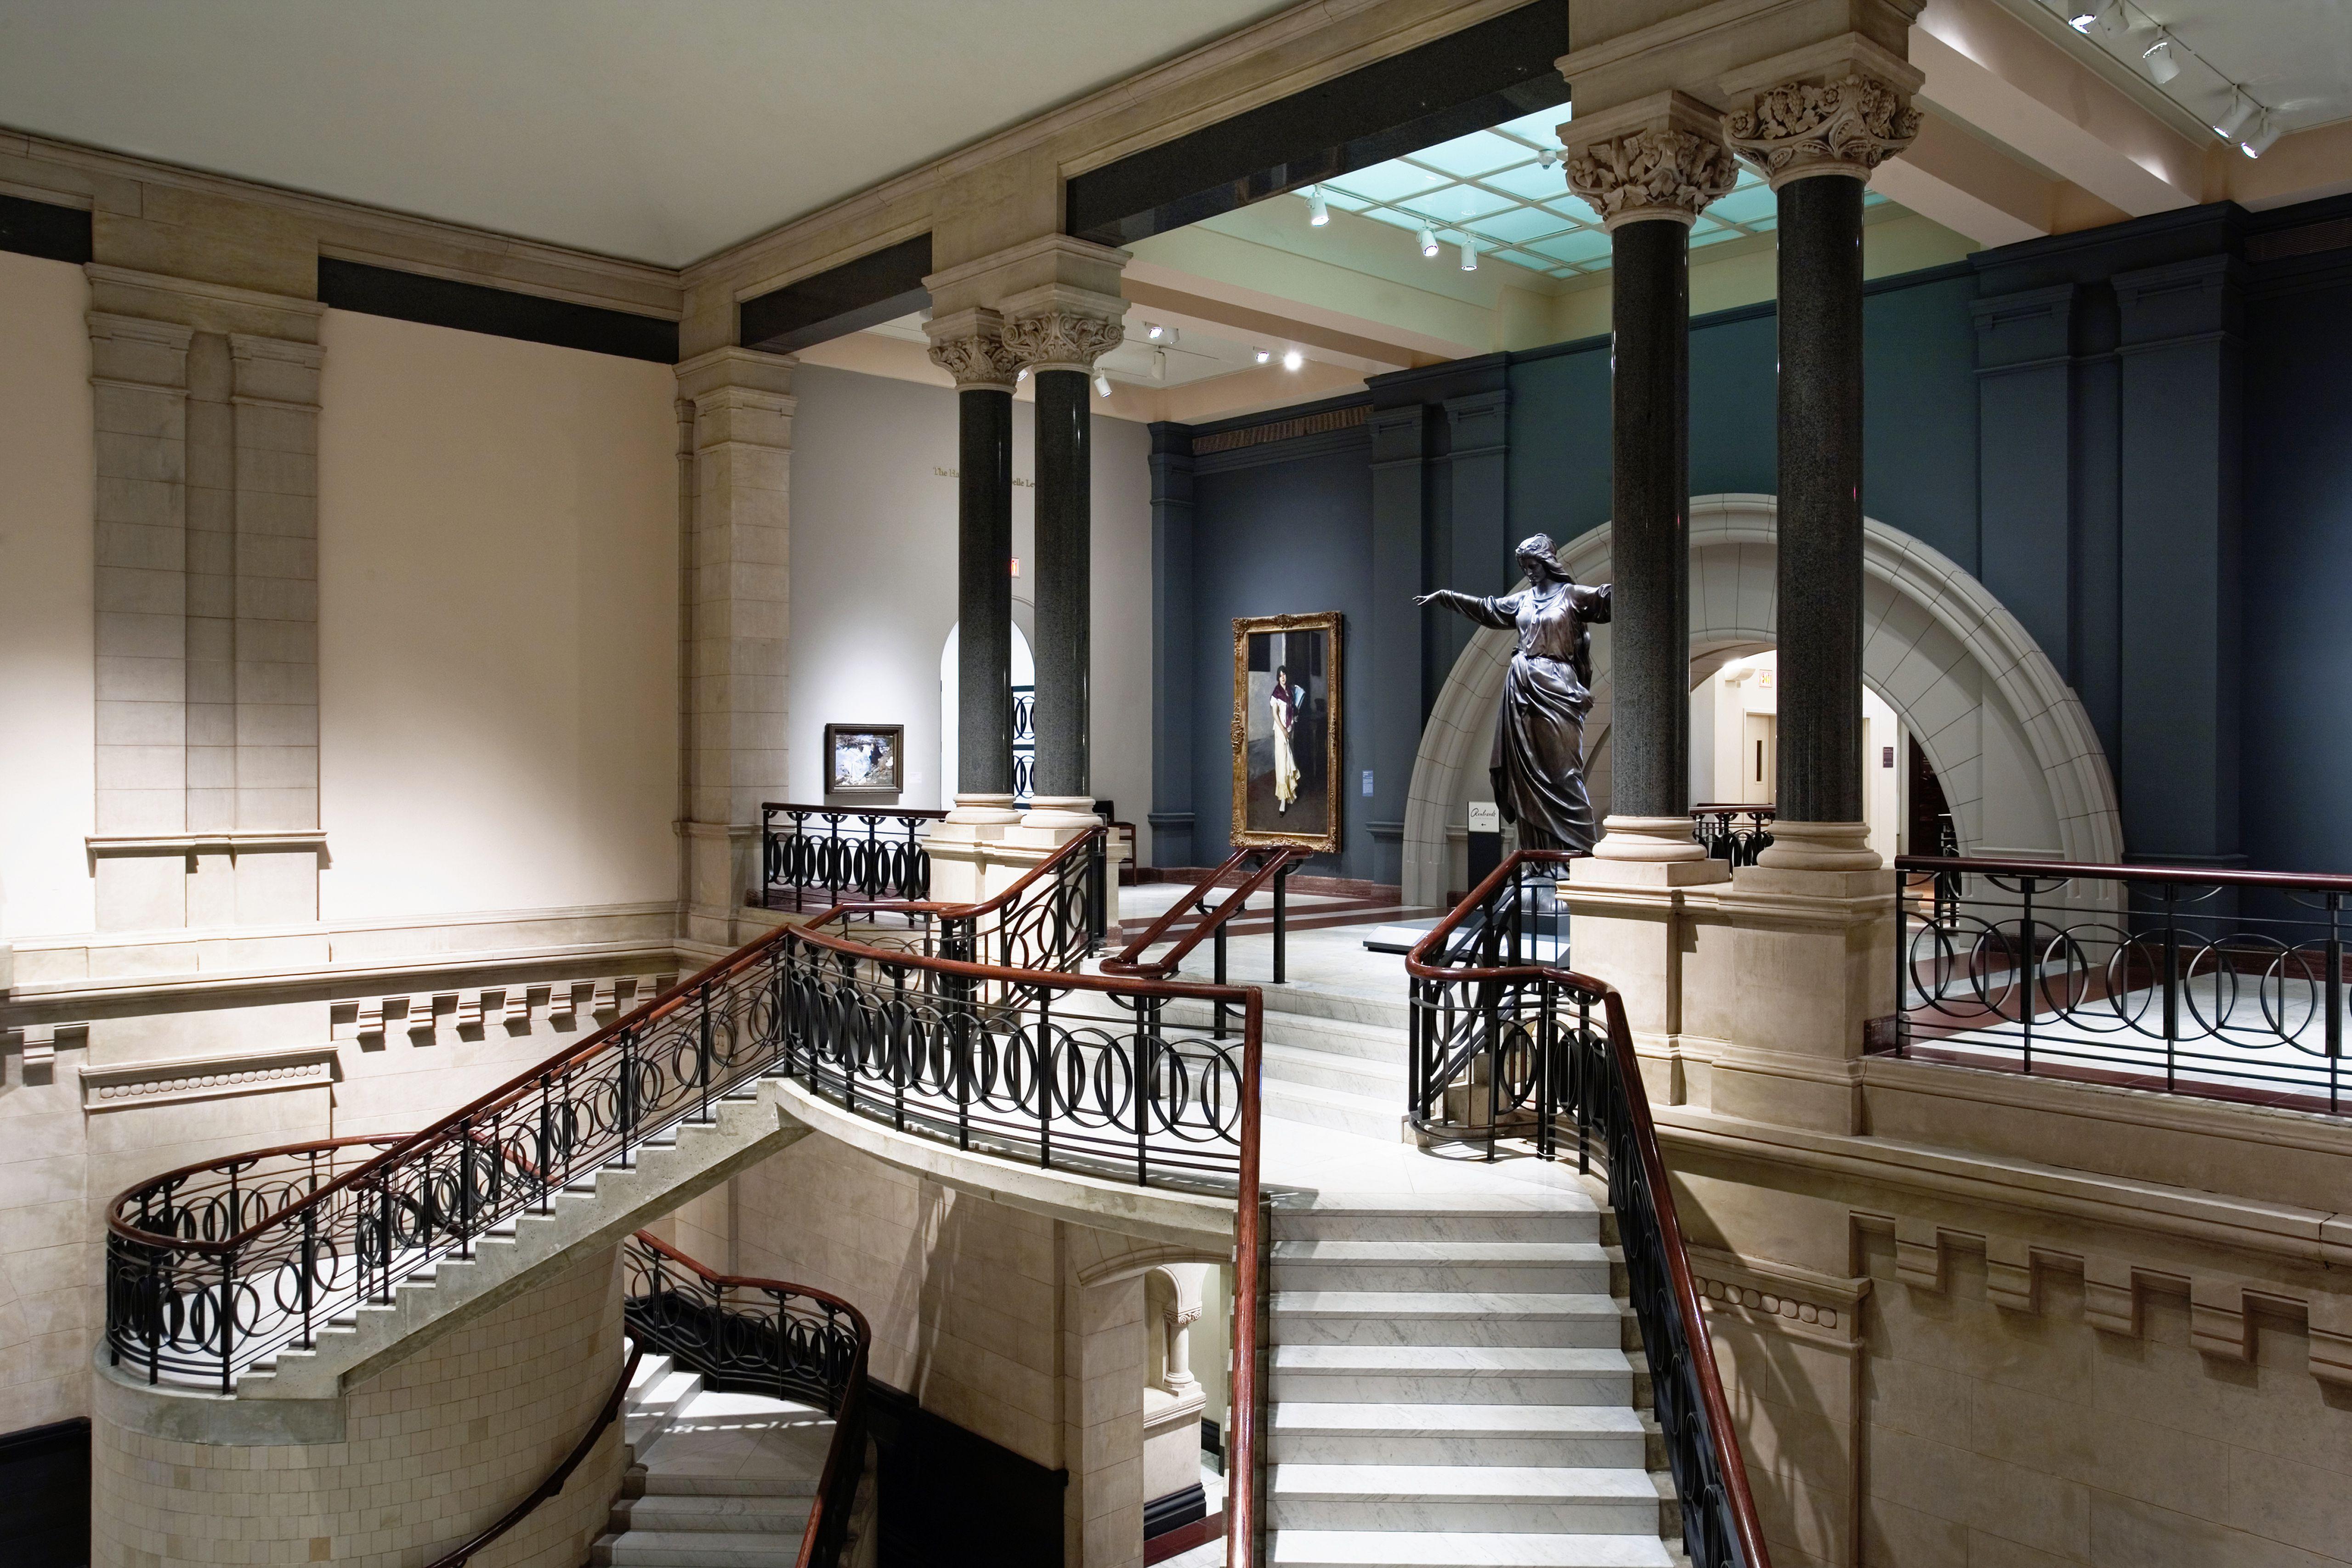 The Great Hall at the Cincinnati Art Museum